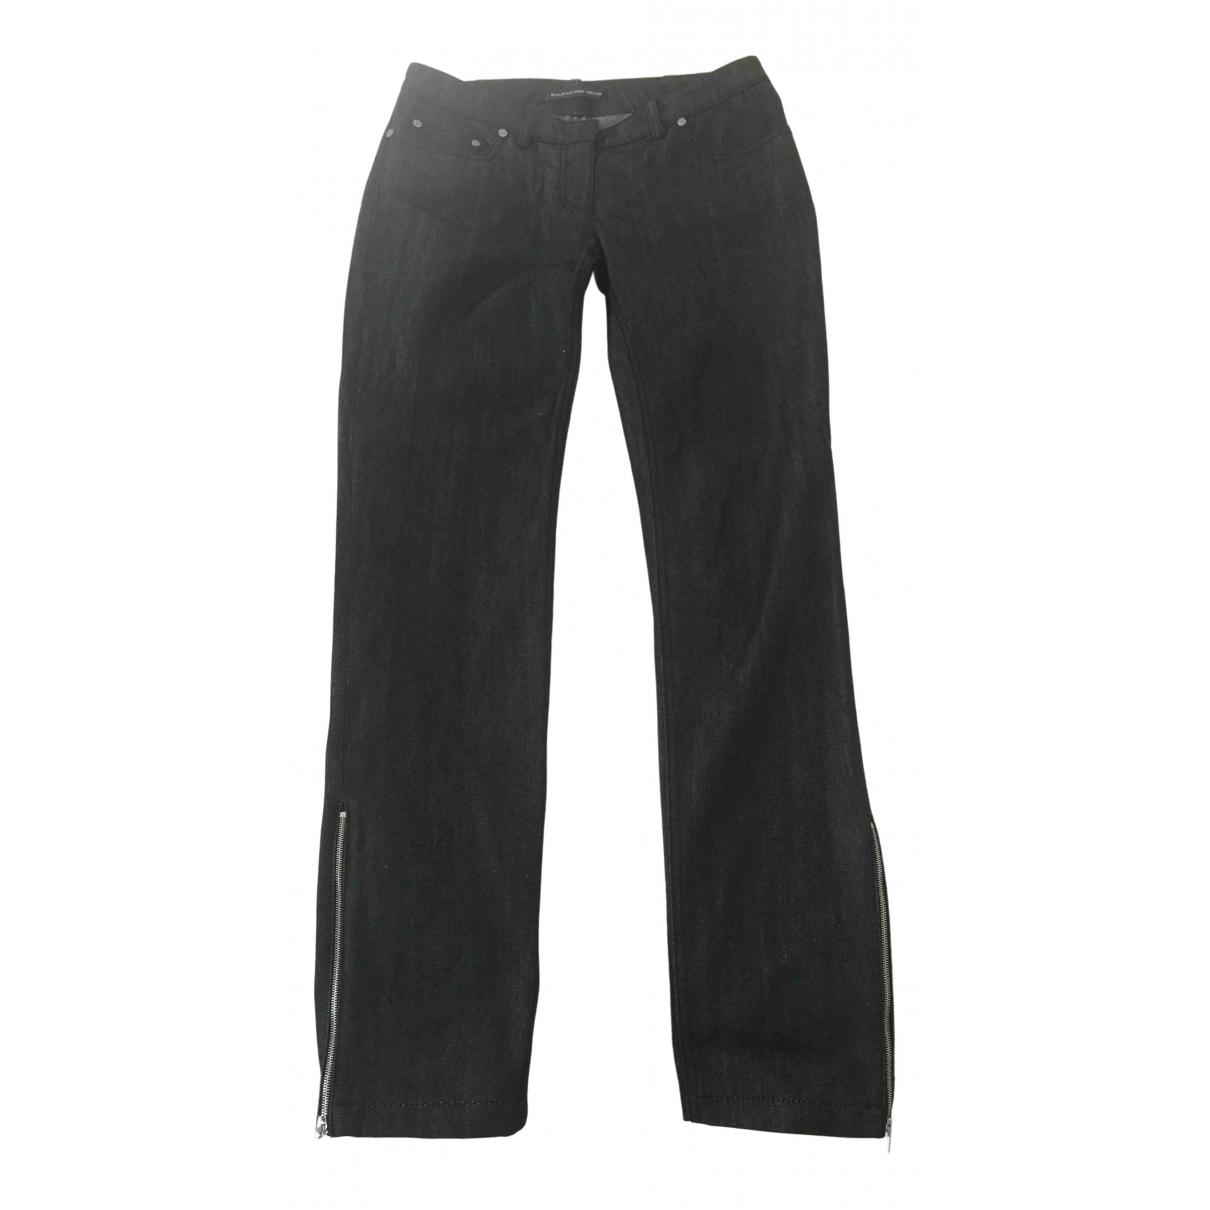 Balenciaga \N Black Denim - Jeans Trousers for Women 36 IT